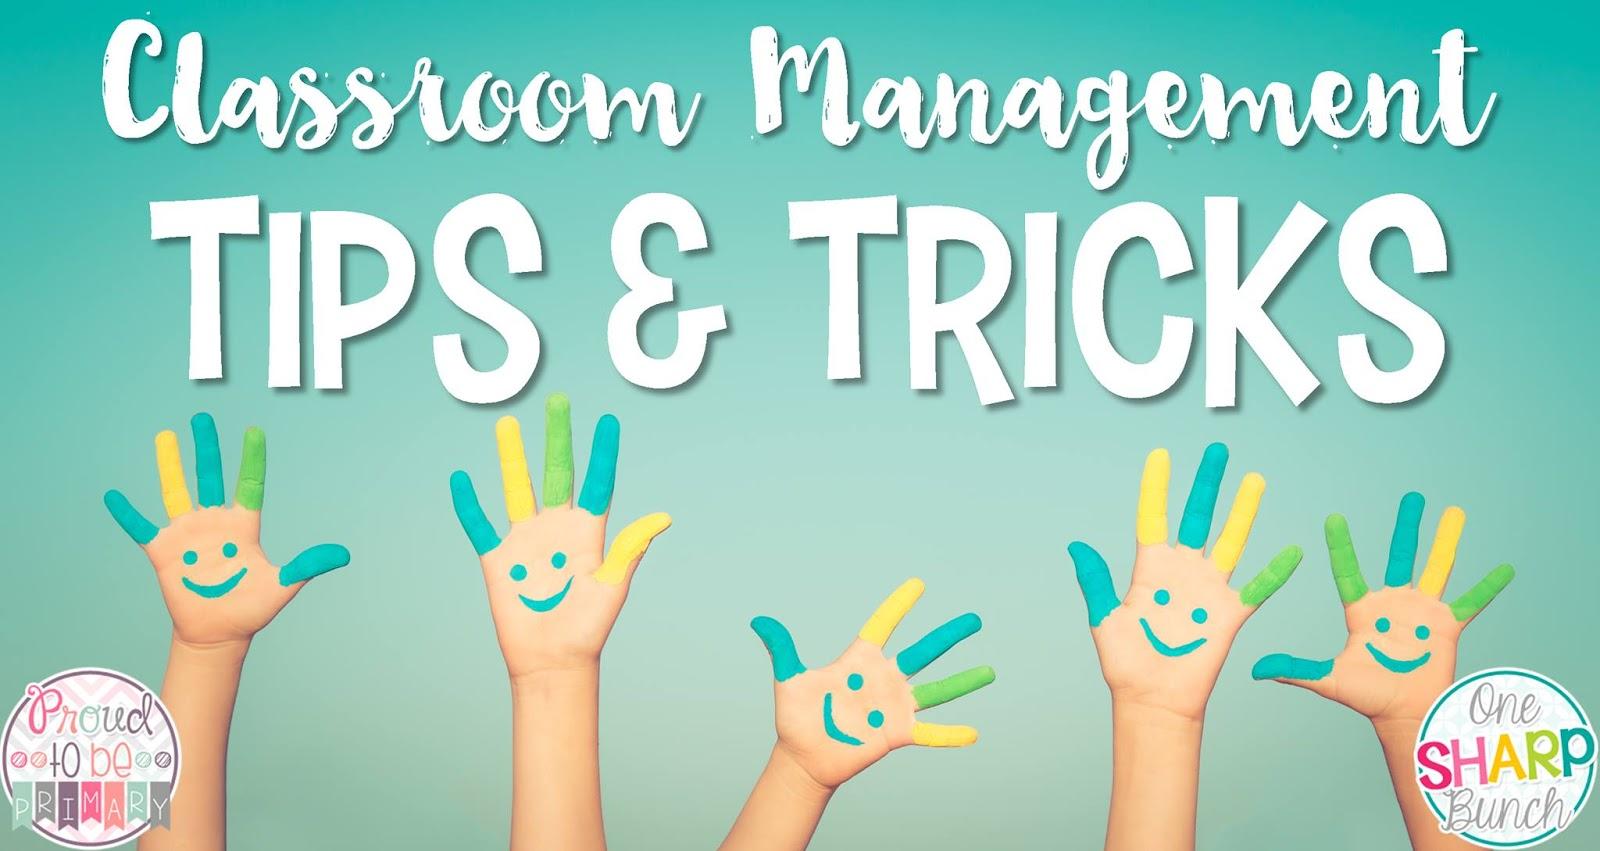 Classroom Management Ideas In Kindergarten : Classroom management tips tricks freebies one sharp